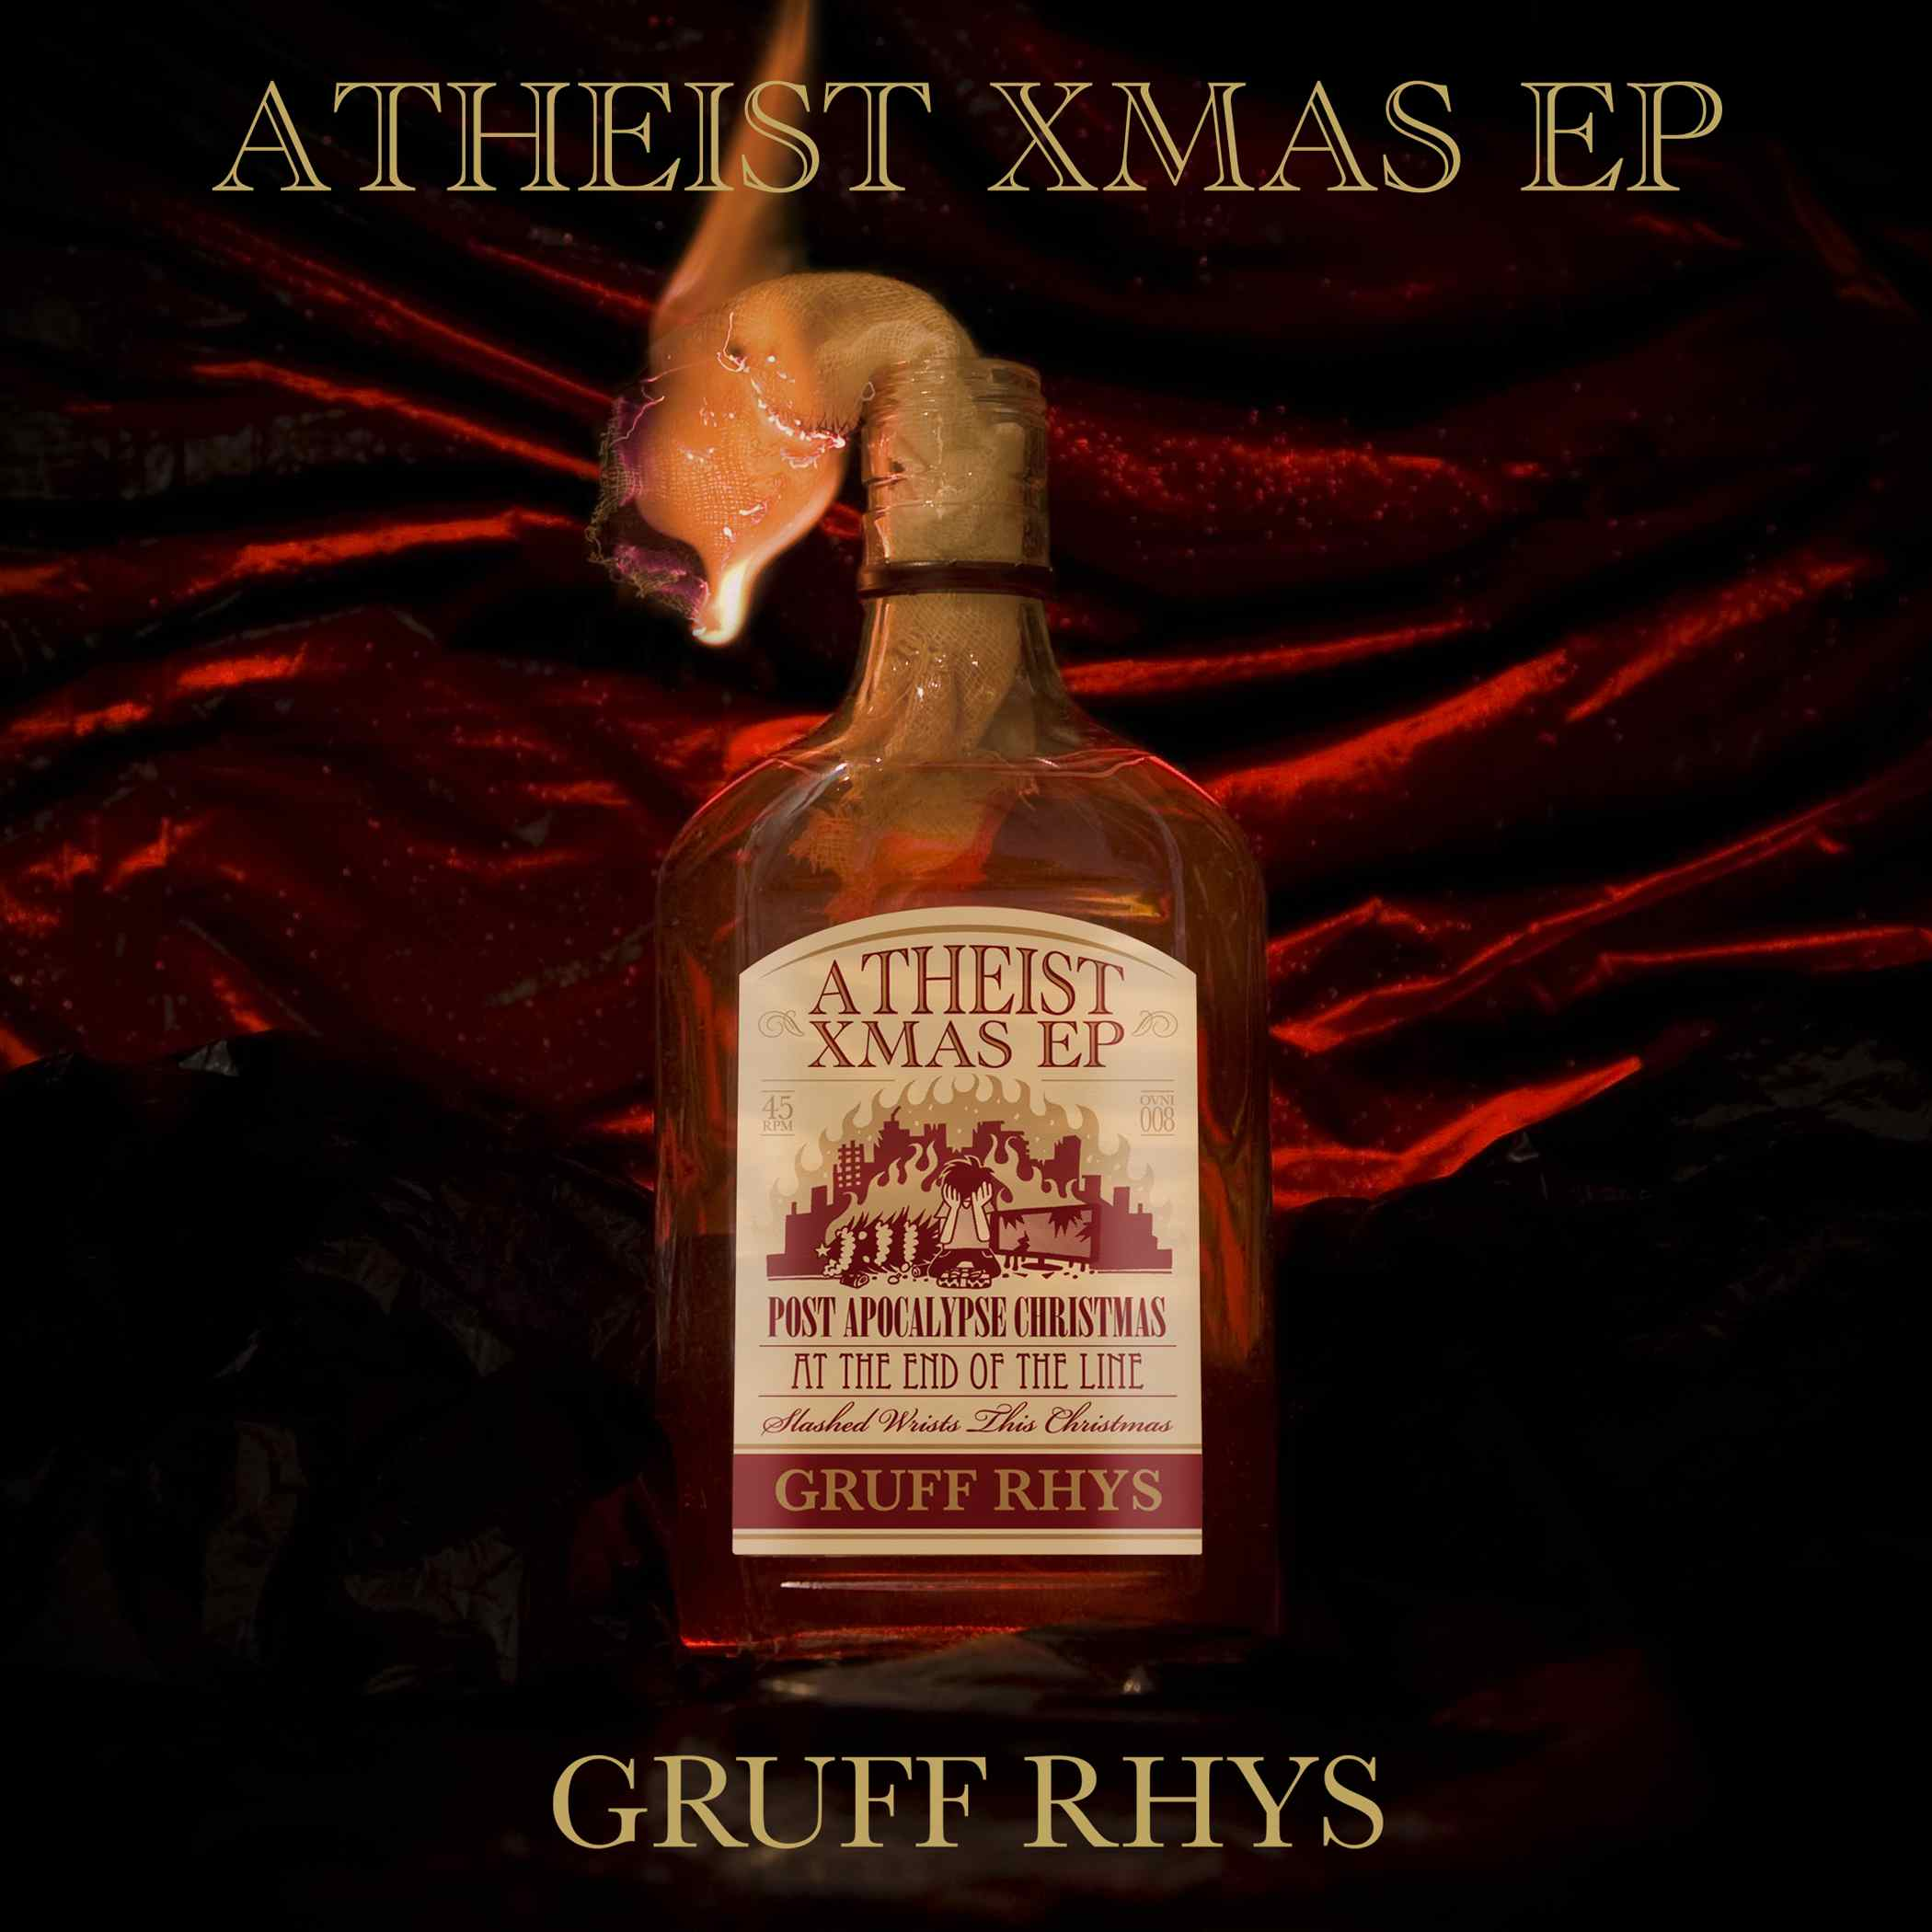 Gruff Rhys, Atheist Christmas